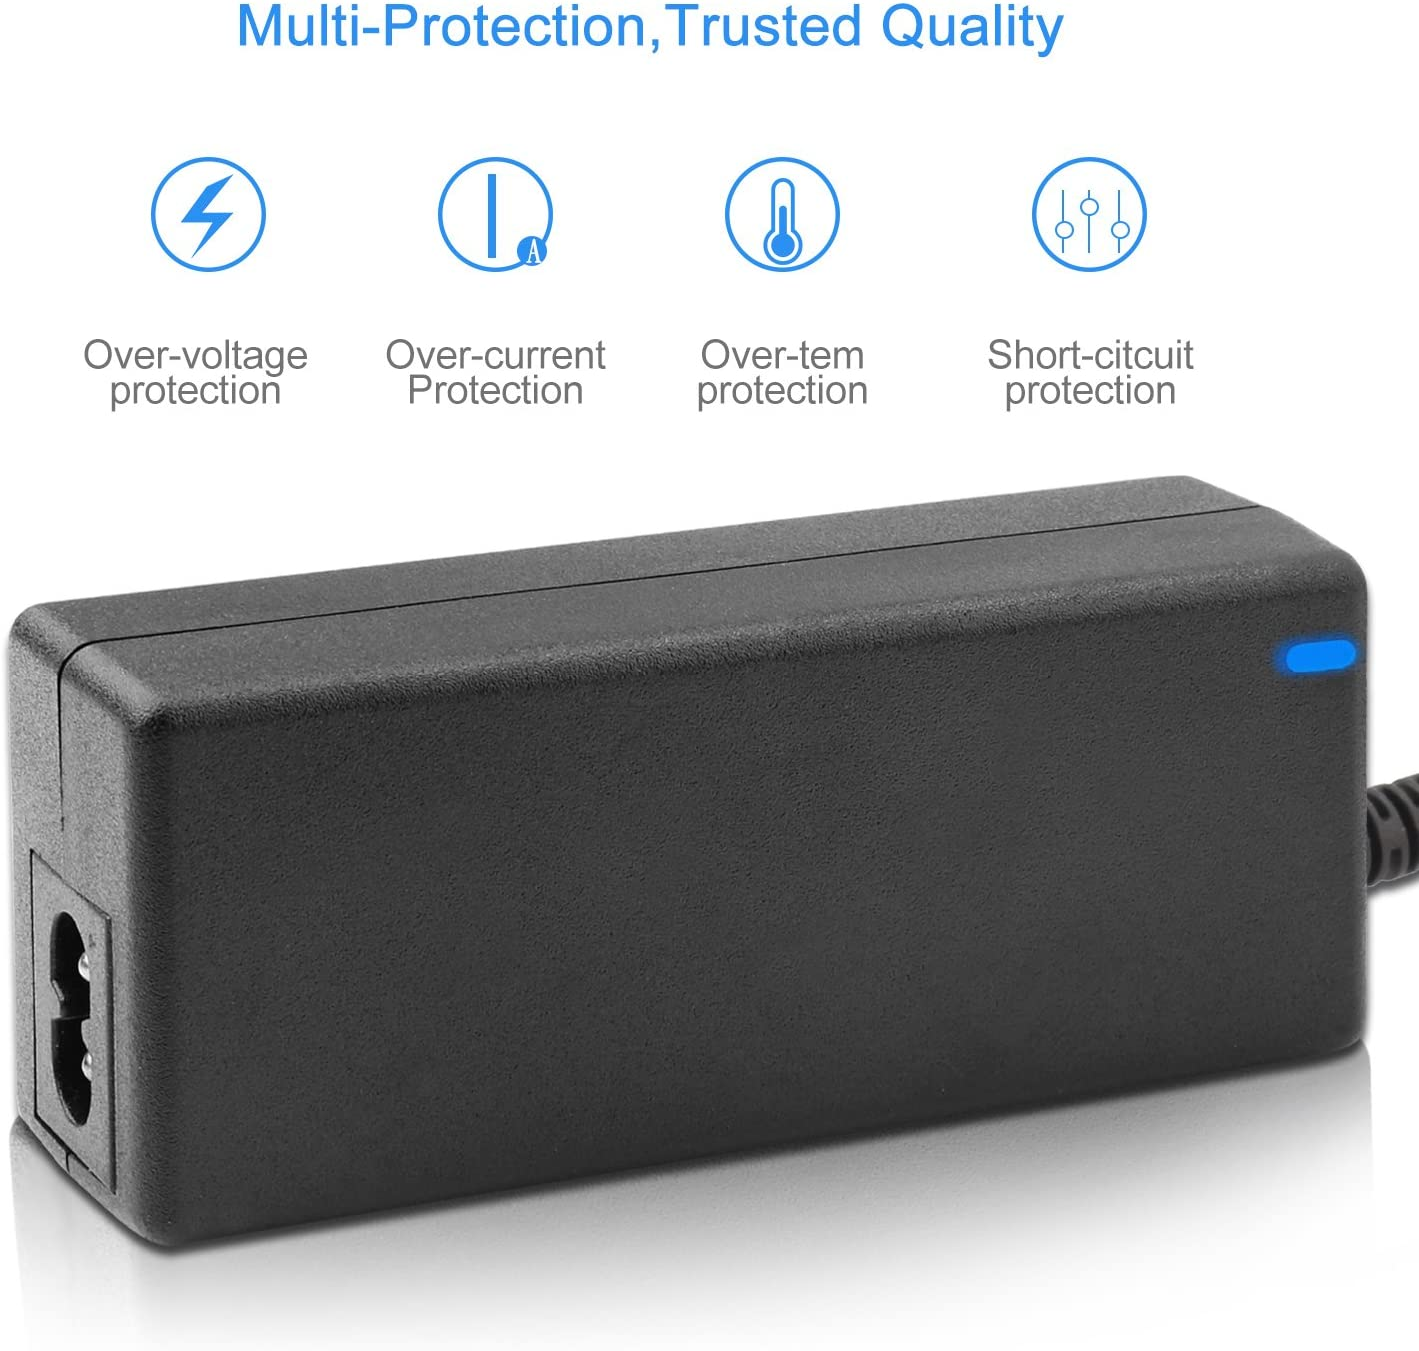 AC Adapter For Samsung Soundbar A4024_FPN A4024-FPN A4024FPN 24VDC Power Supply